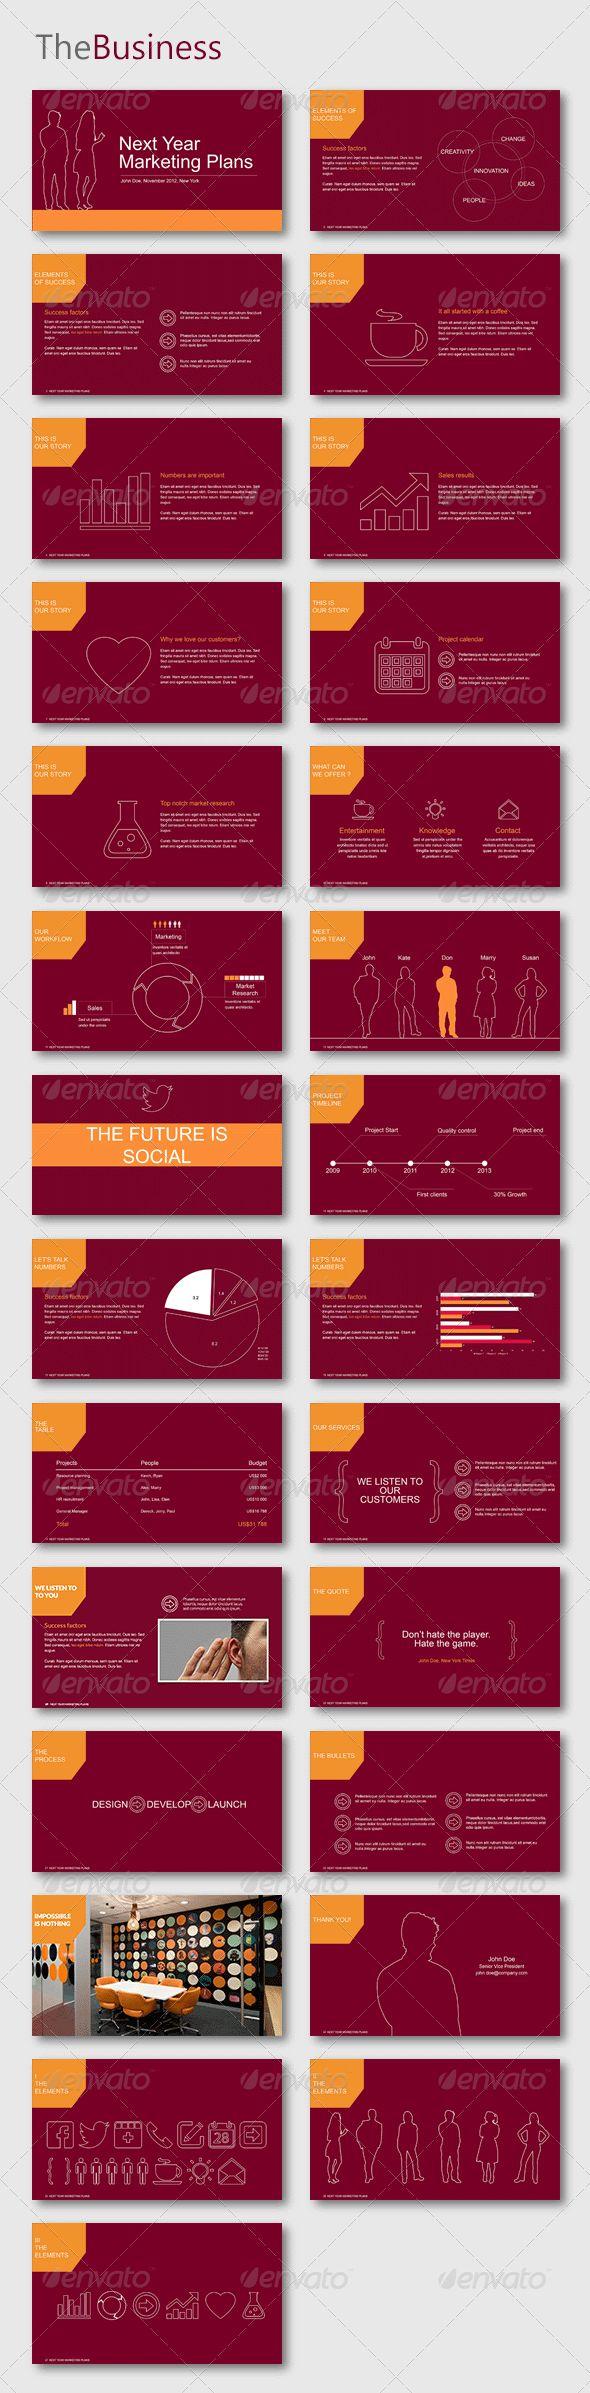 improvepresentation | GraphicRiver